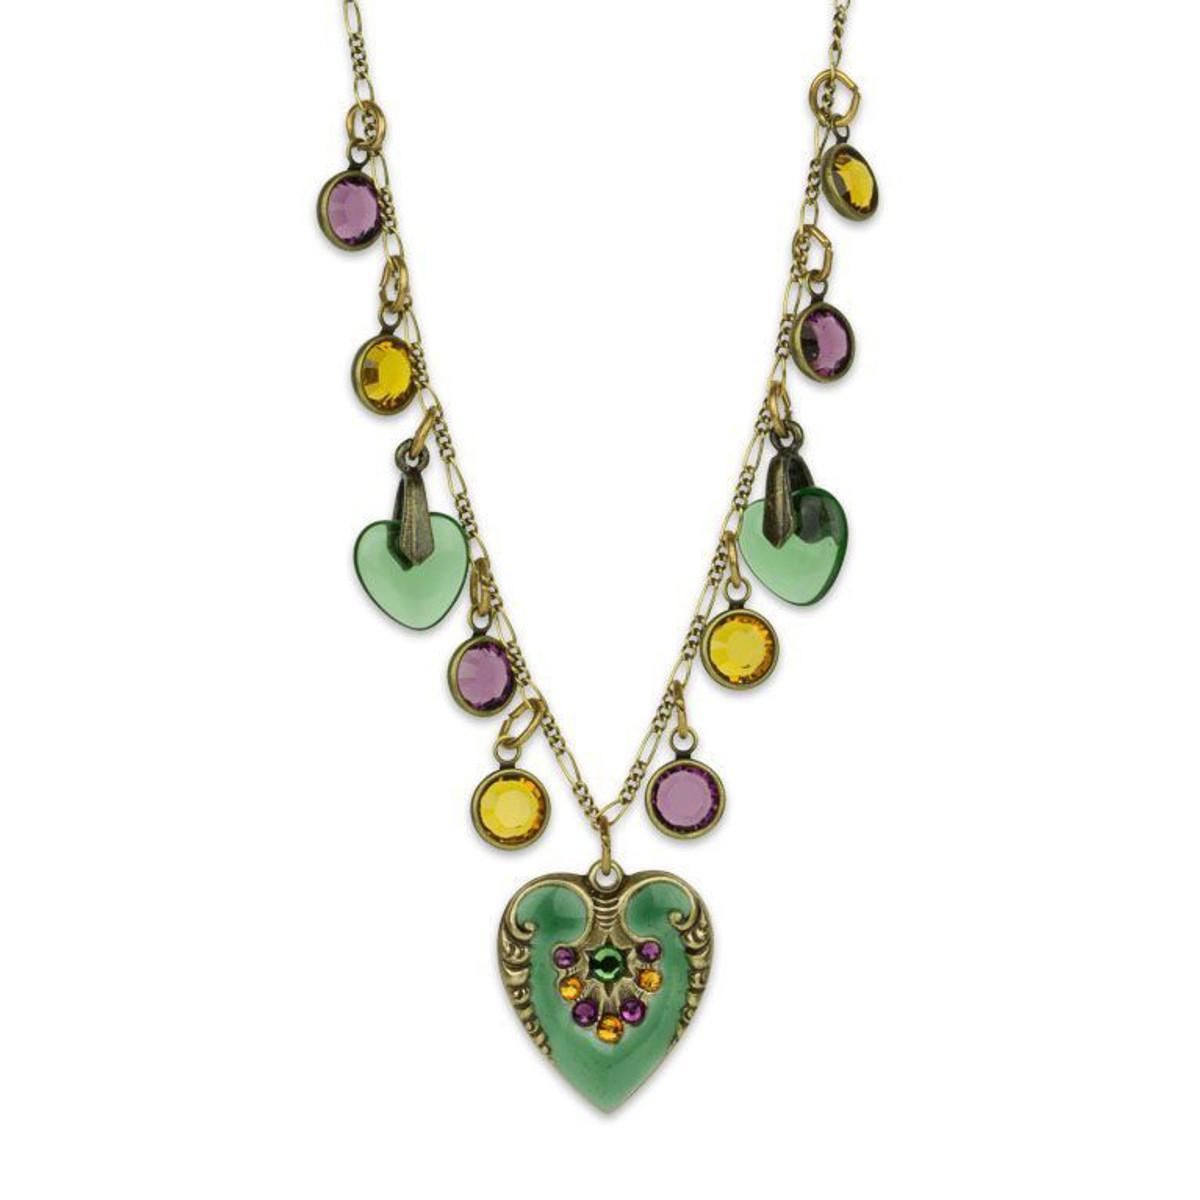 Anne Koplik The Hearts Have It Charm Necklace